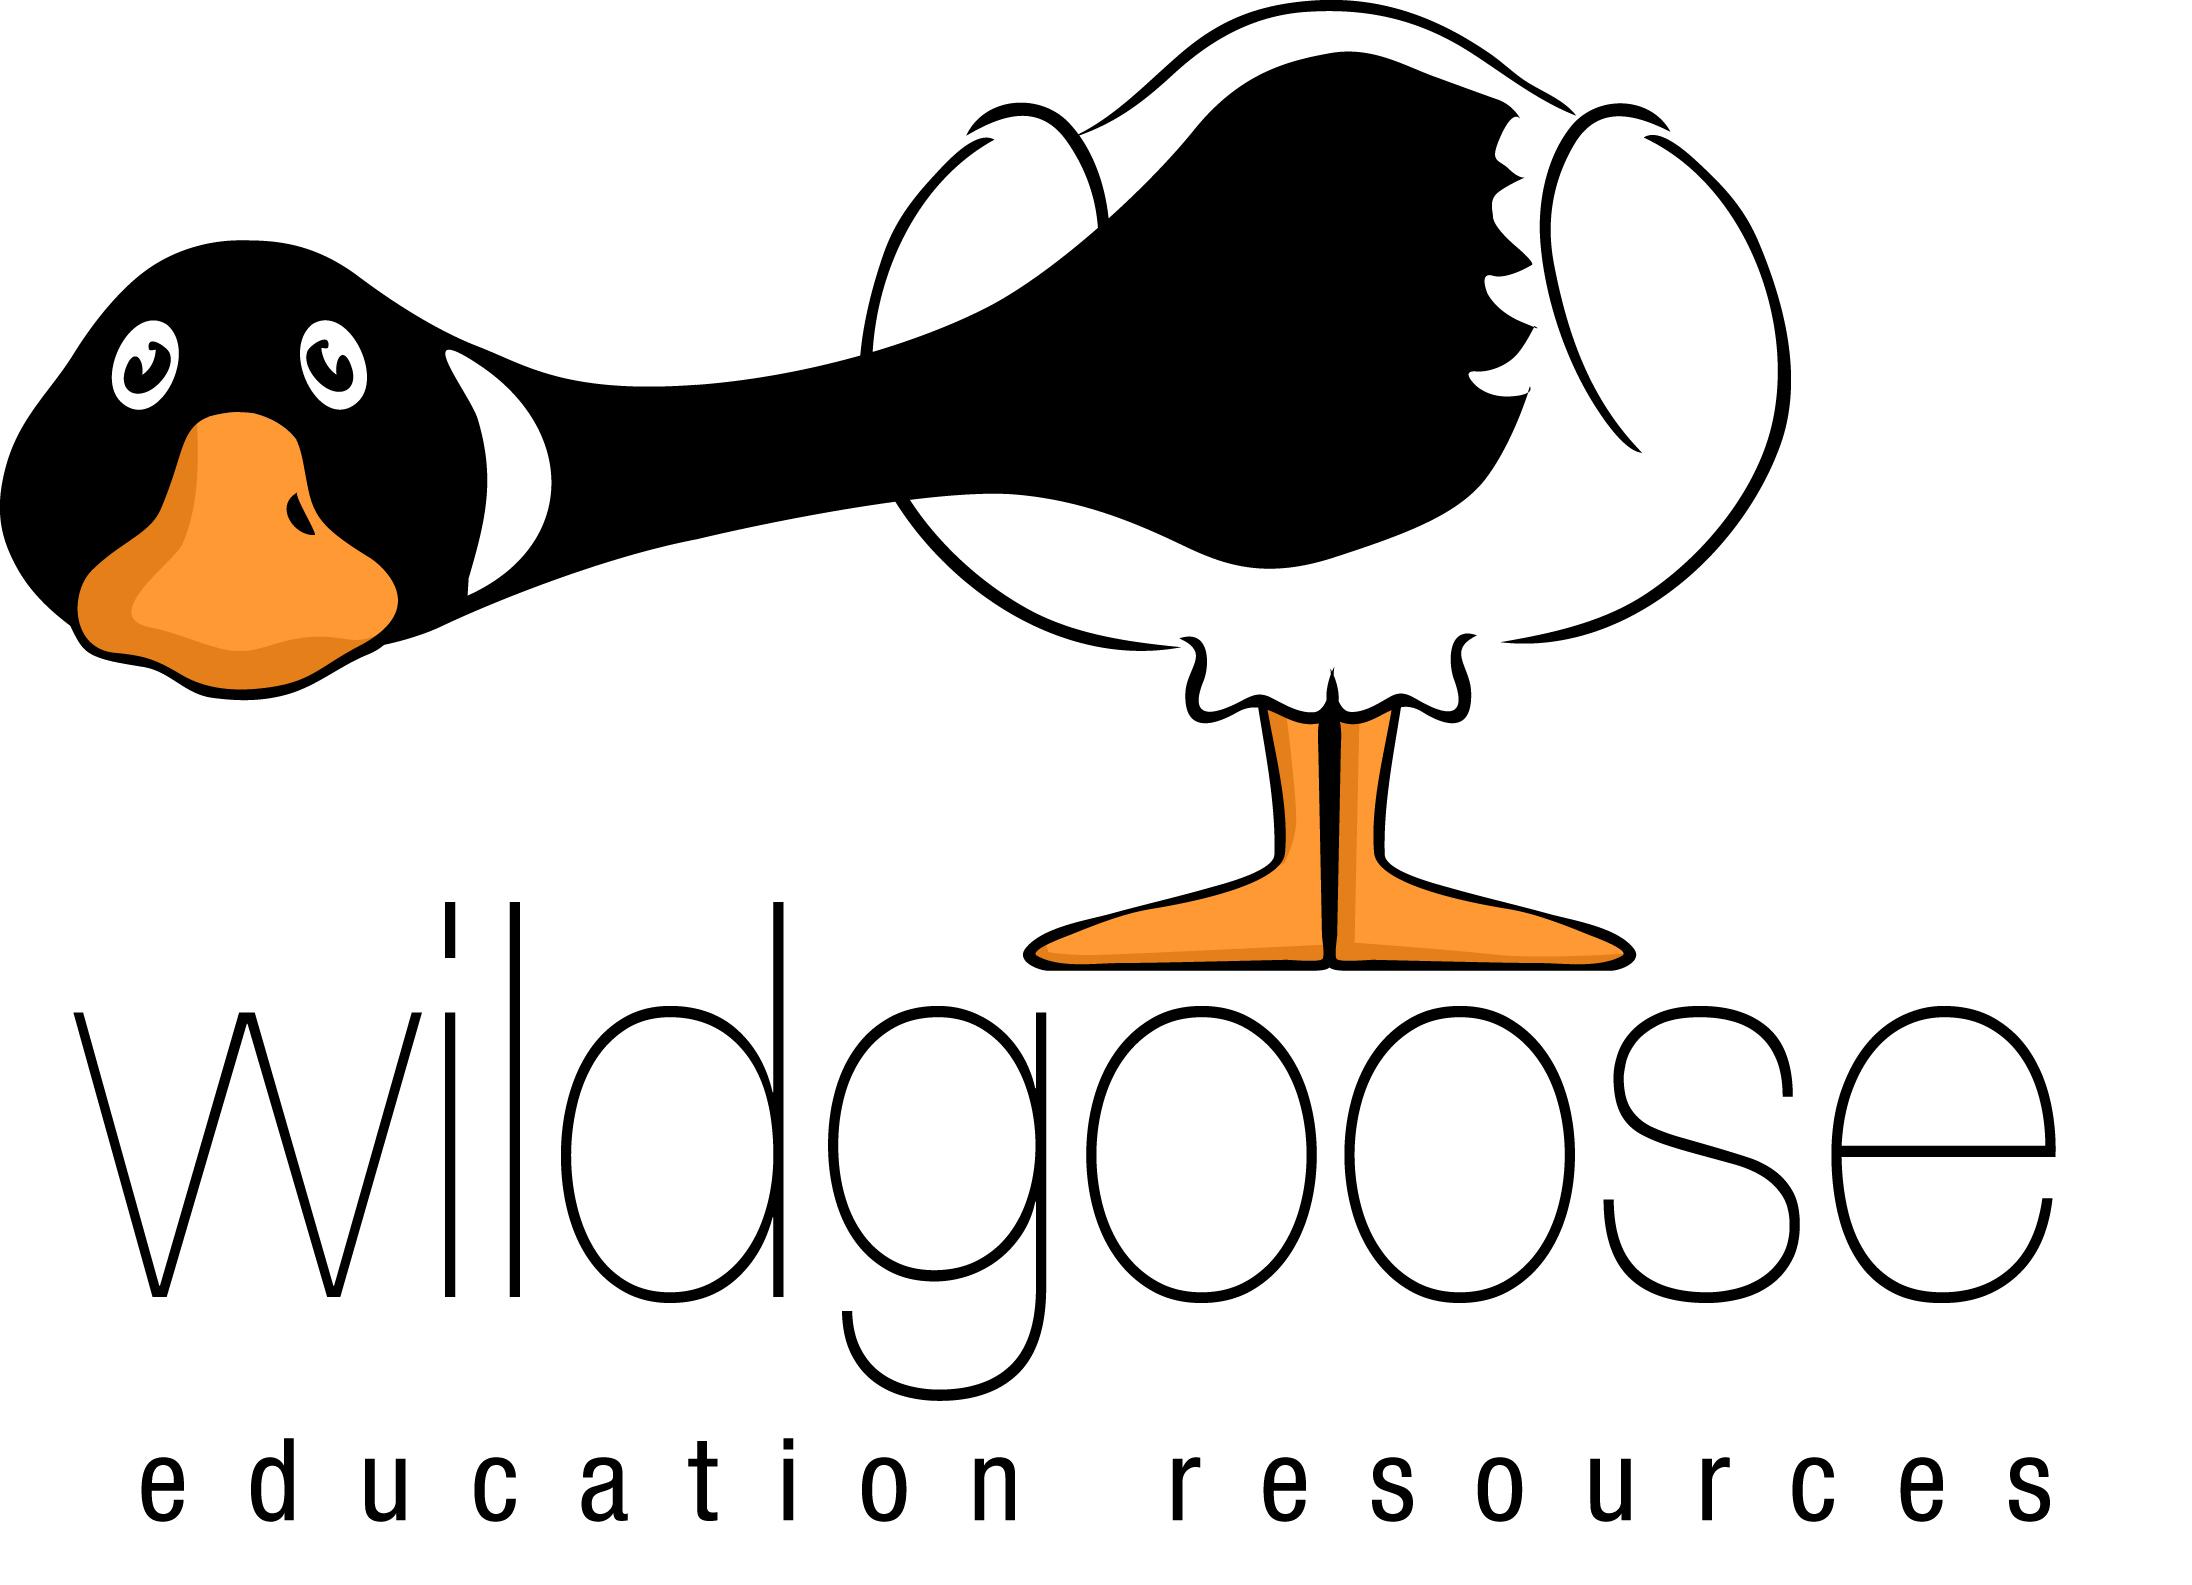 Wildgoose Logo Strap Line